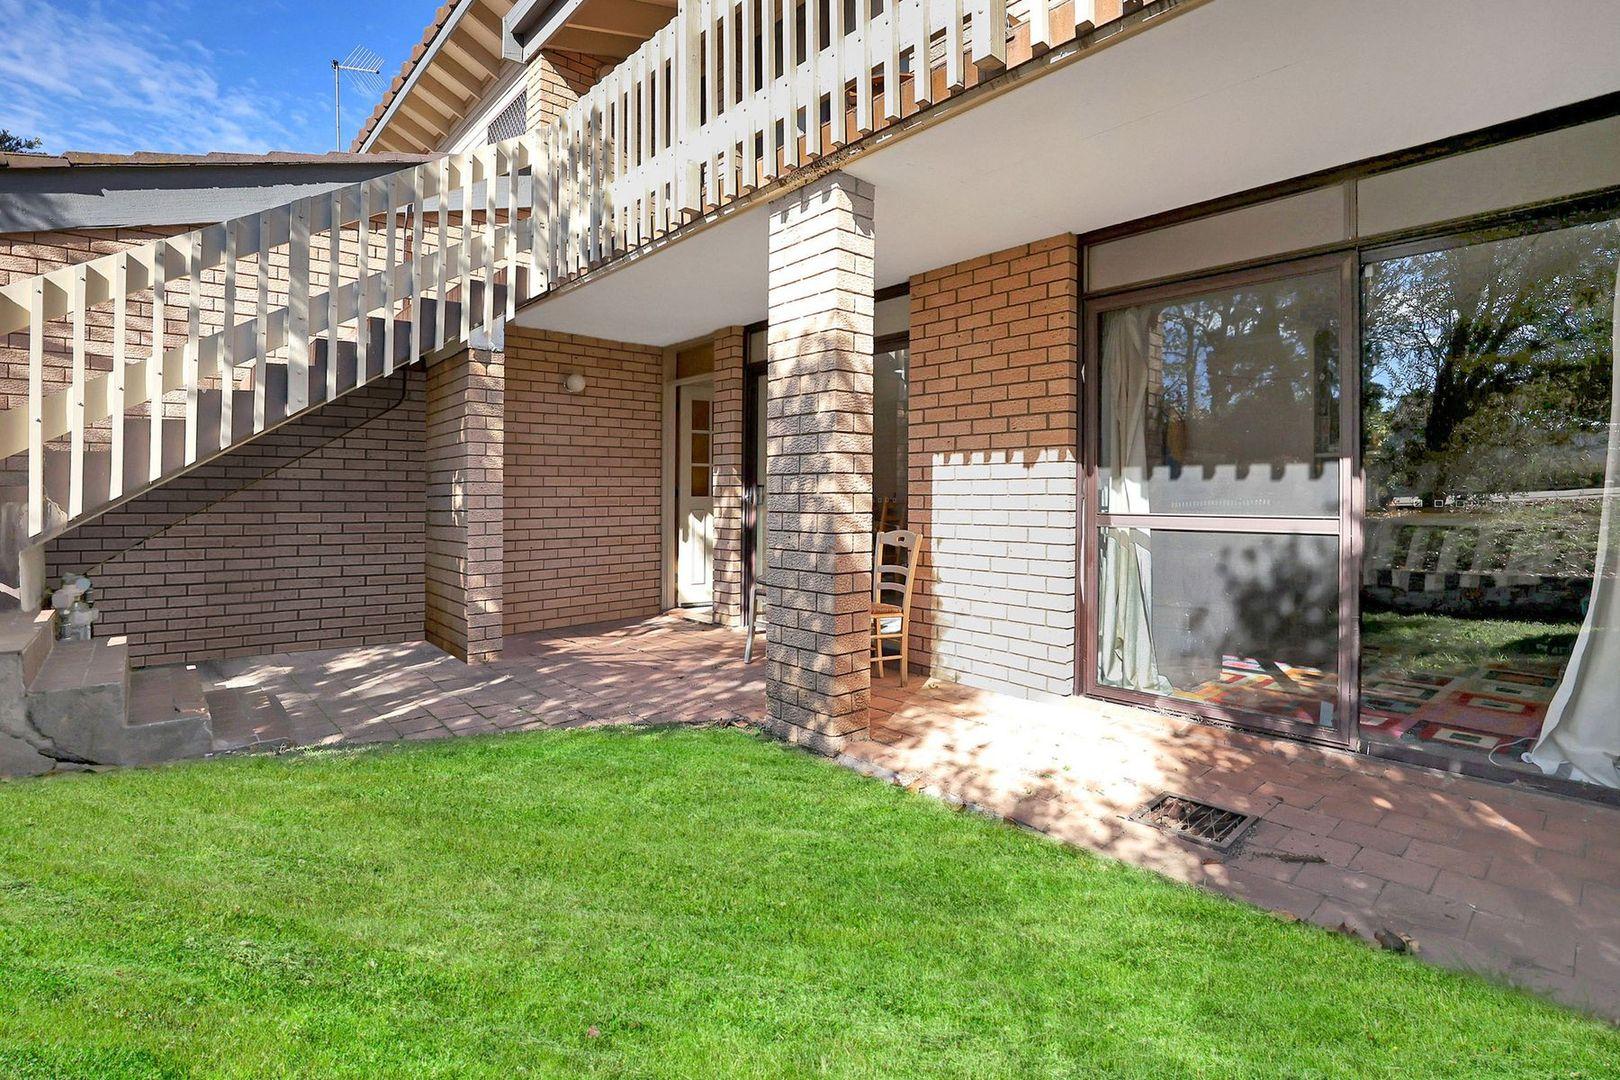 7/142 Durham Street, Bathurst NSW 2795, Image 1